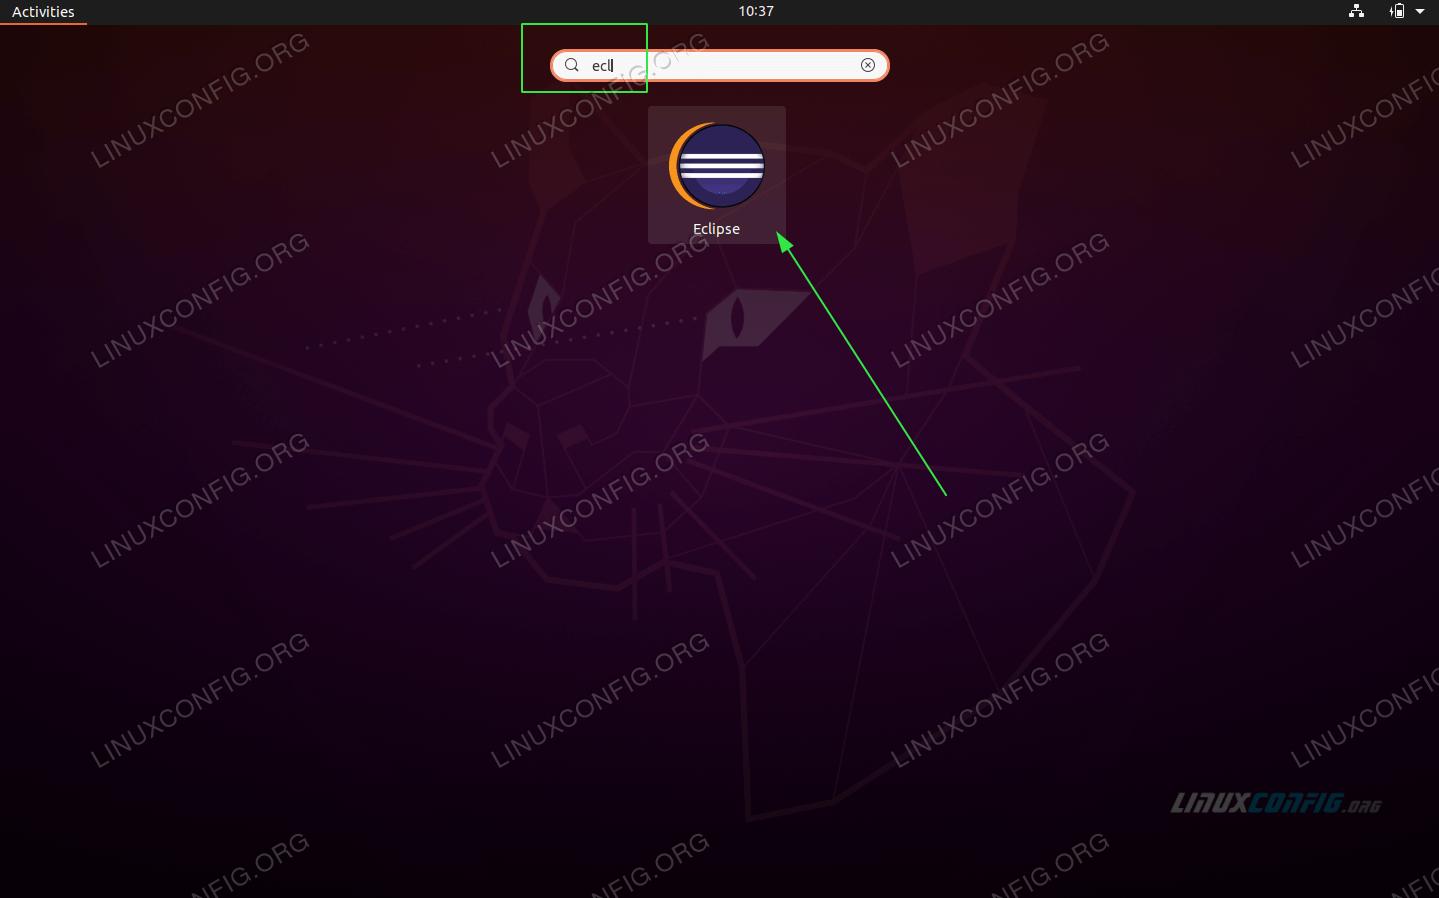 start the Eclipse IDE